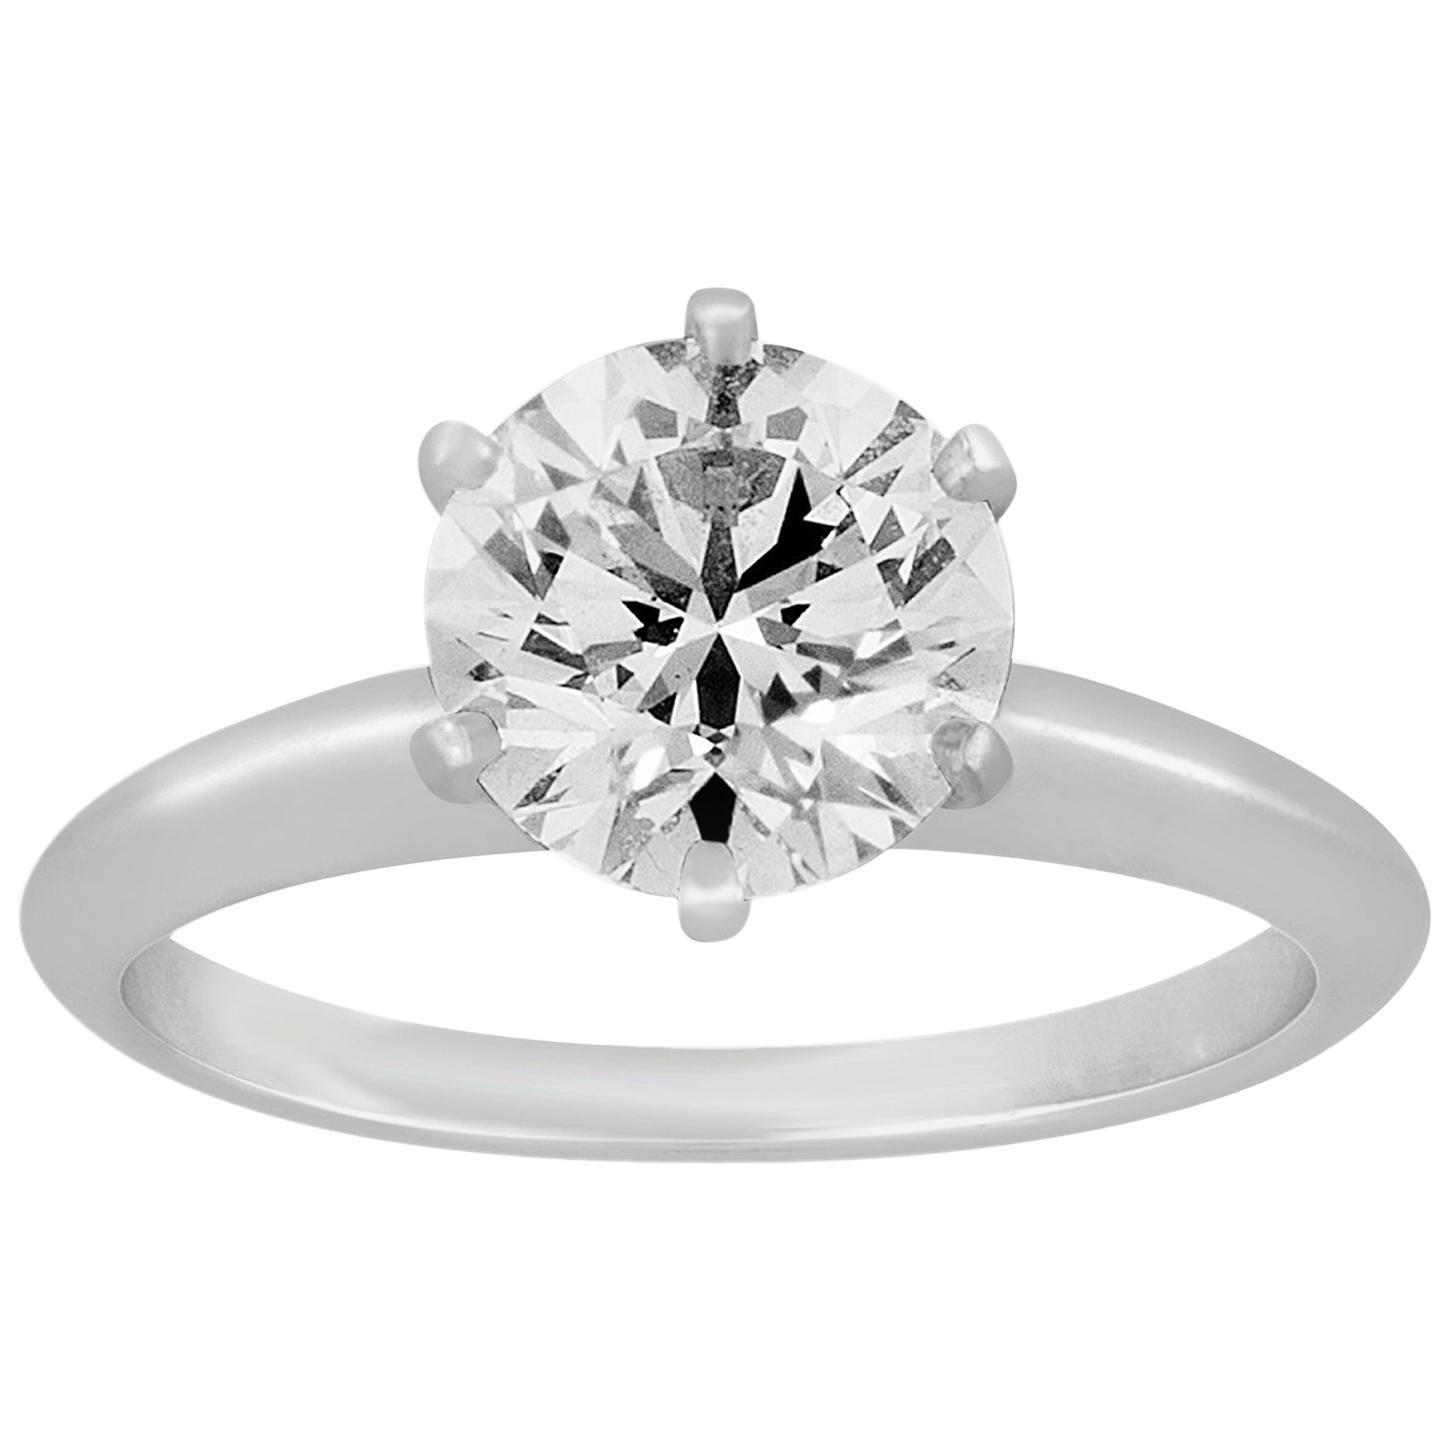 Tiffany & Co. 1.93 Carat G VVS1 Diamond Platinum Ring